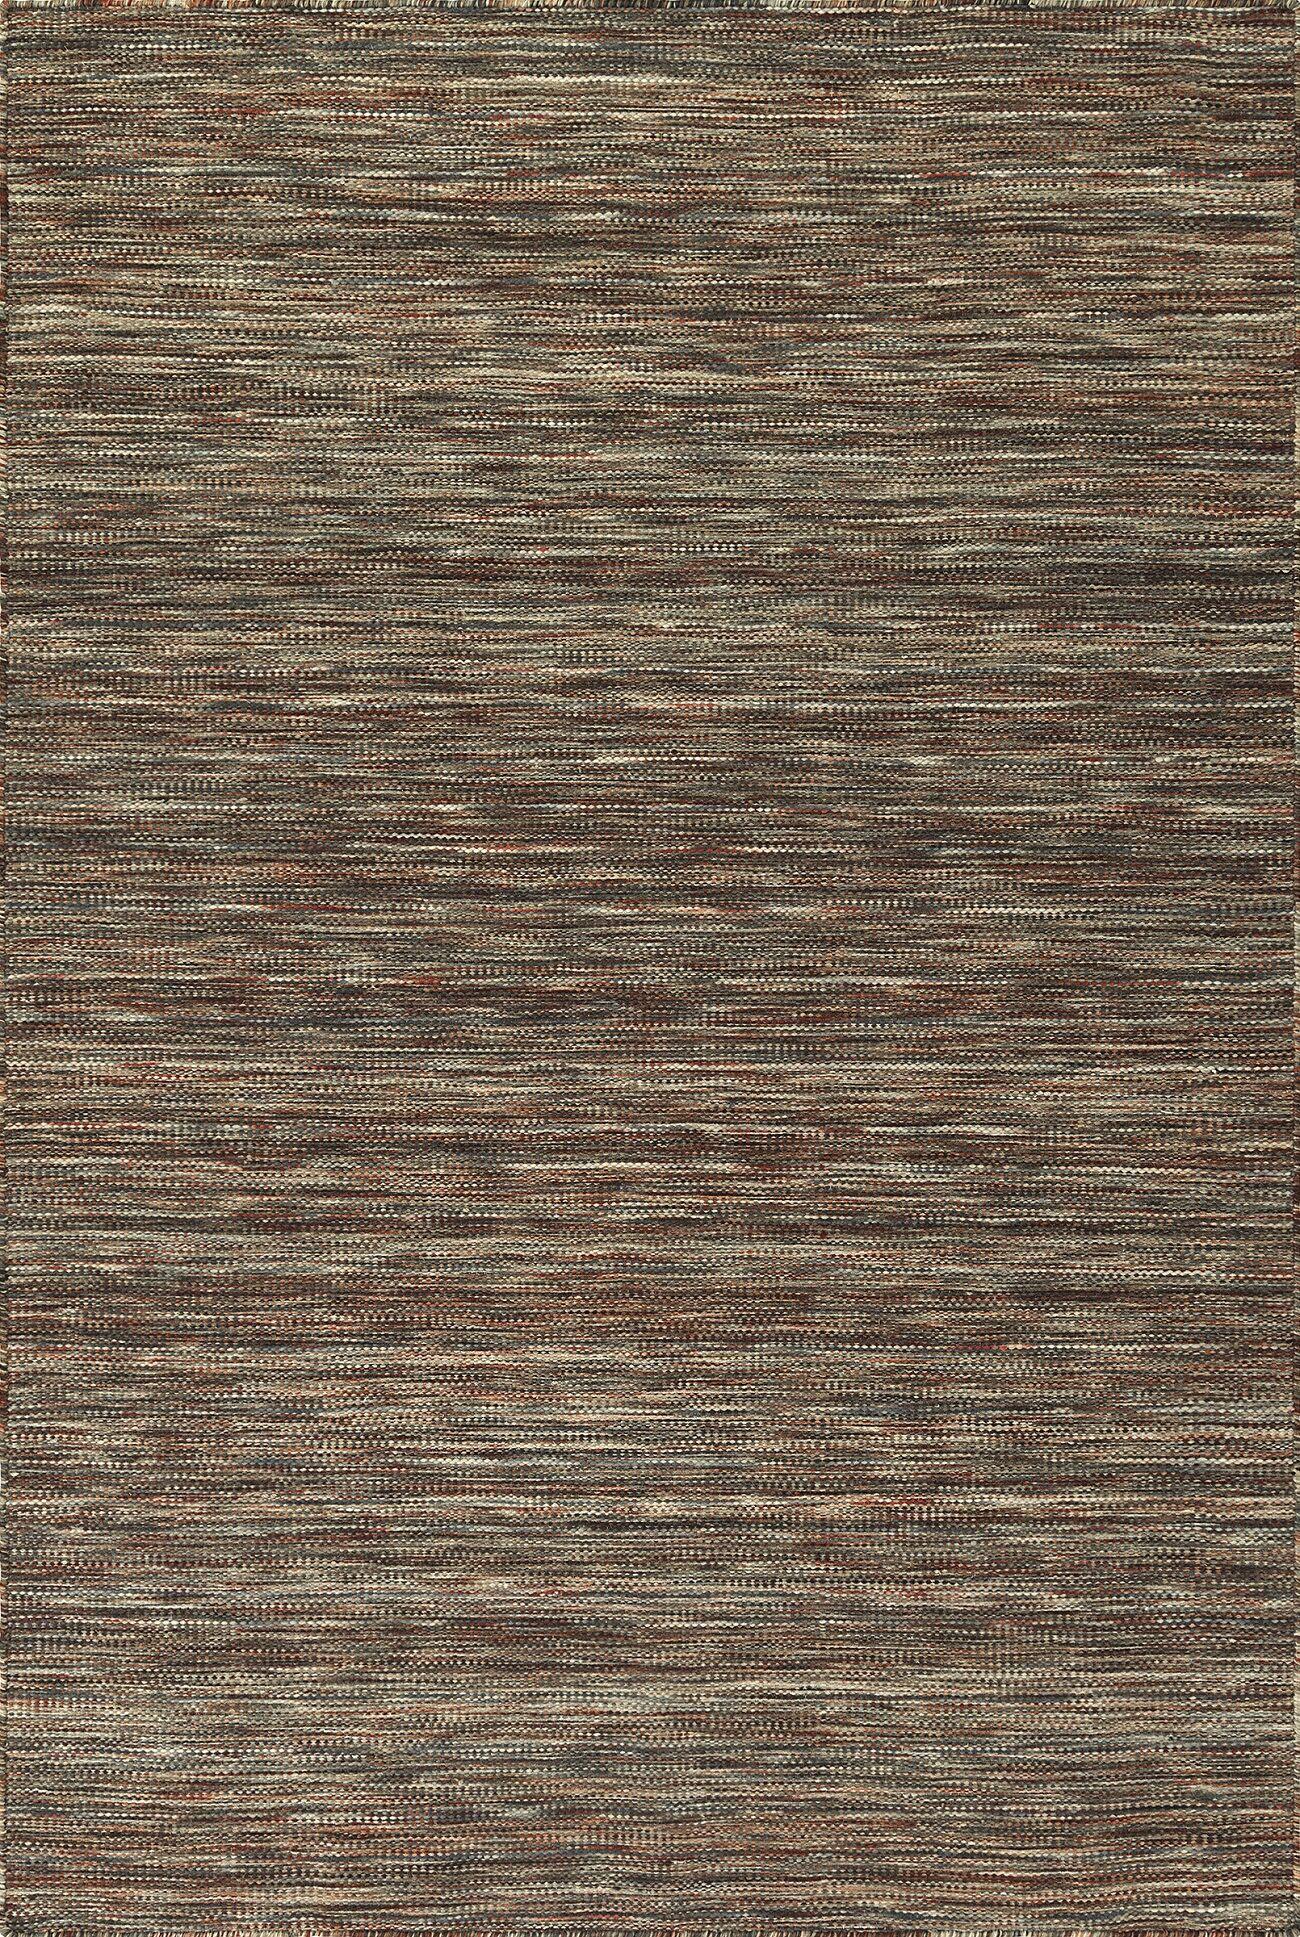 Indre Hand Woven Wool Kaleidoscope Area Rug Rug Size: Rectangle 3'6